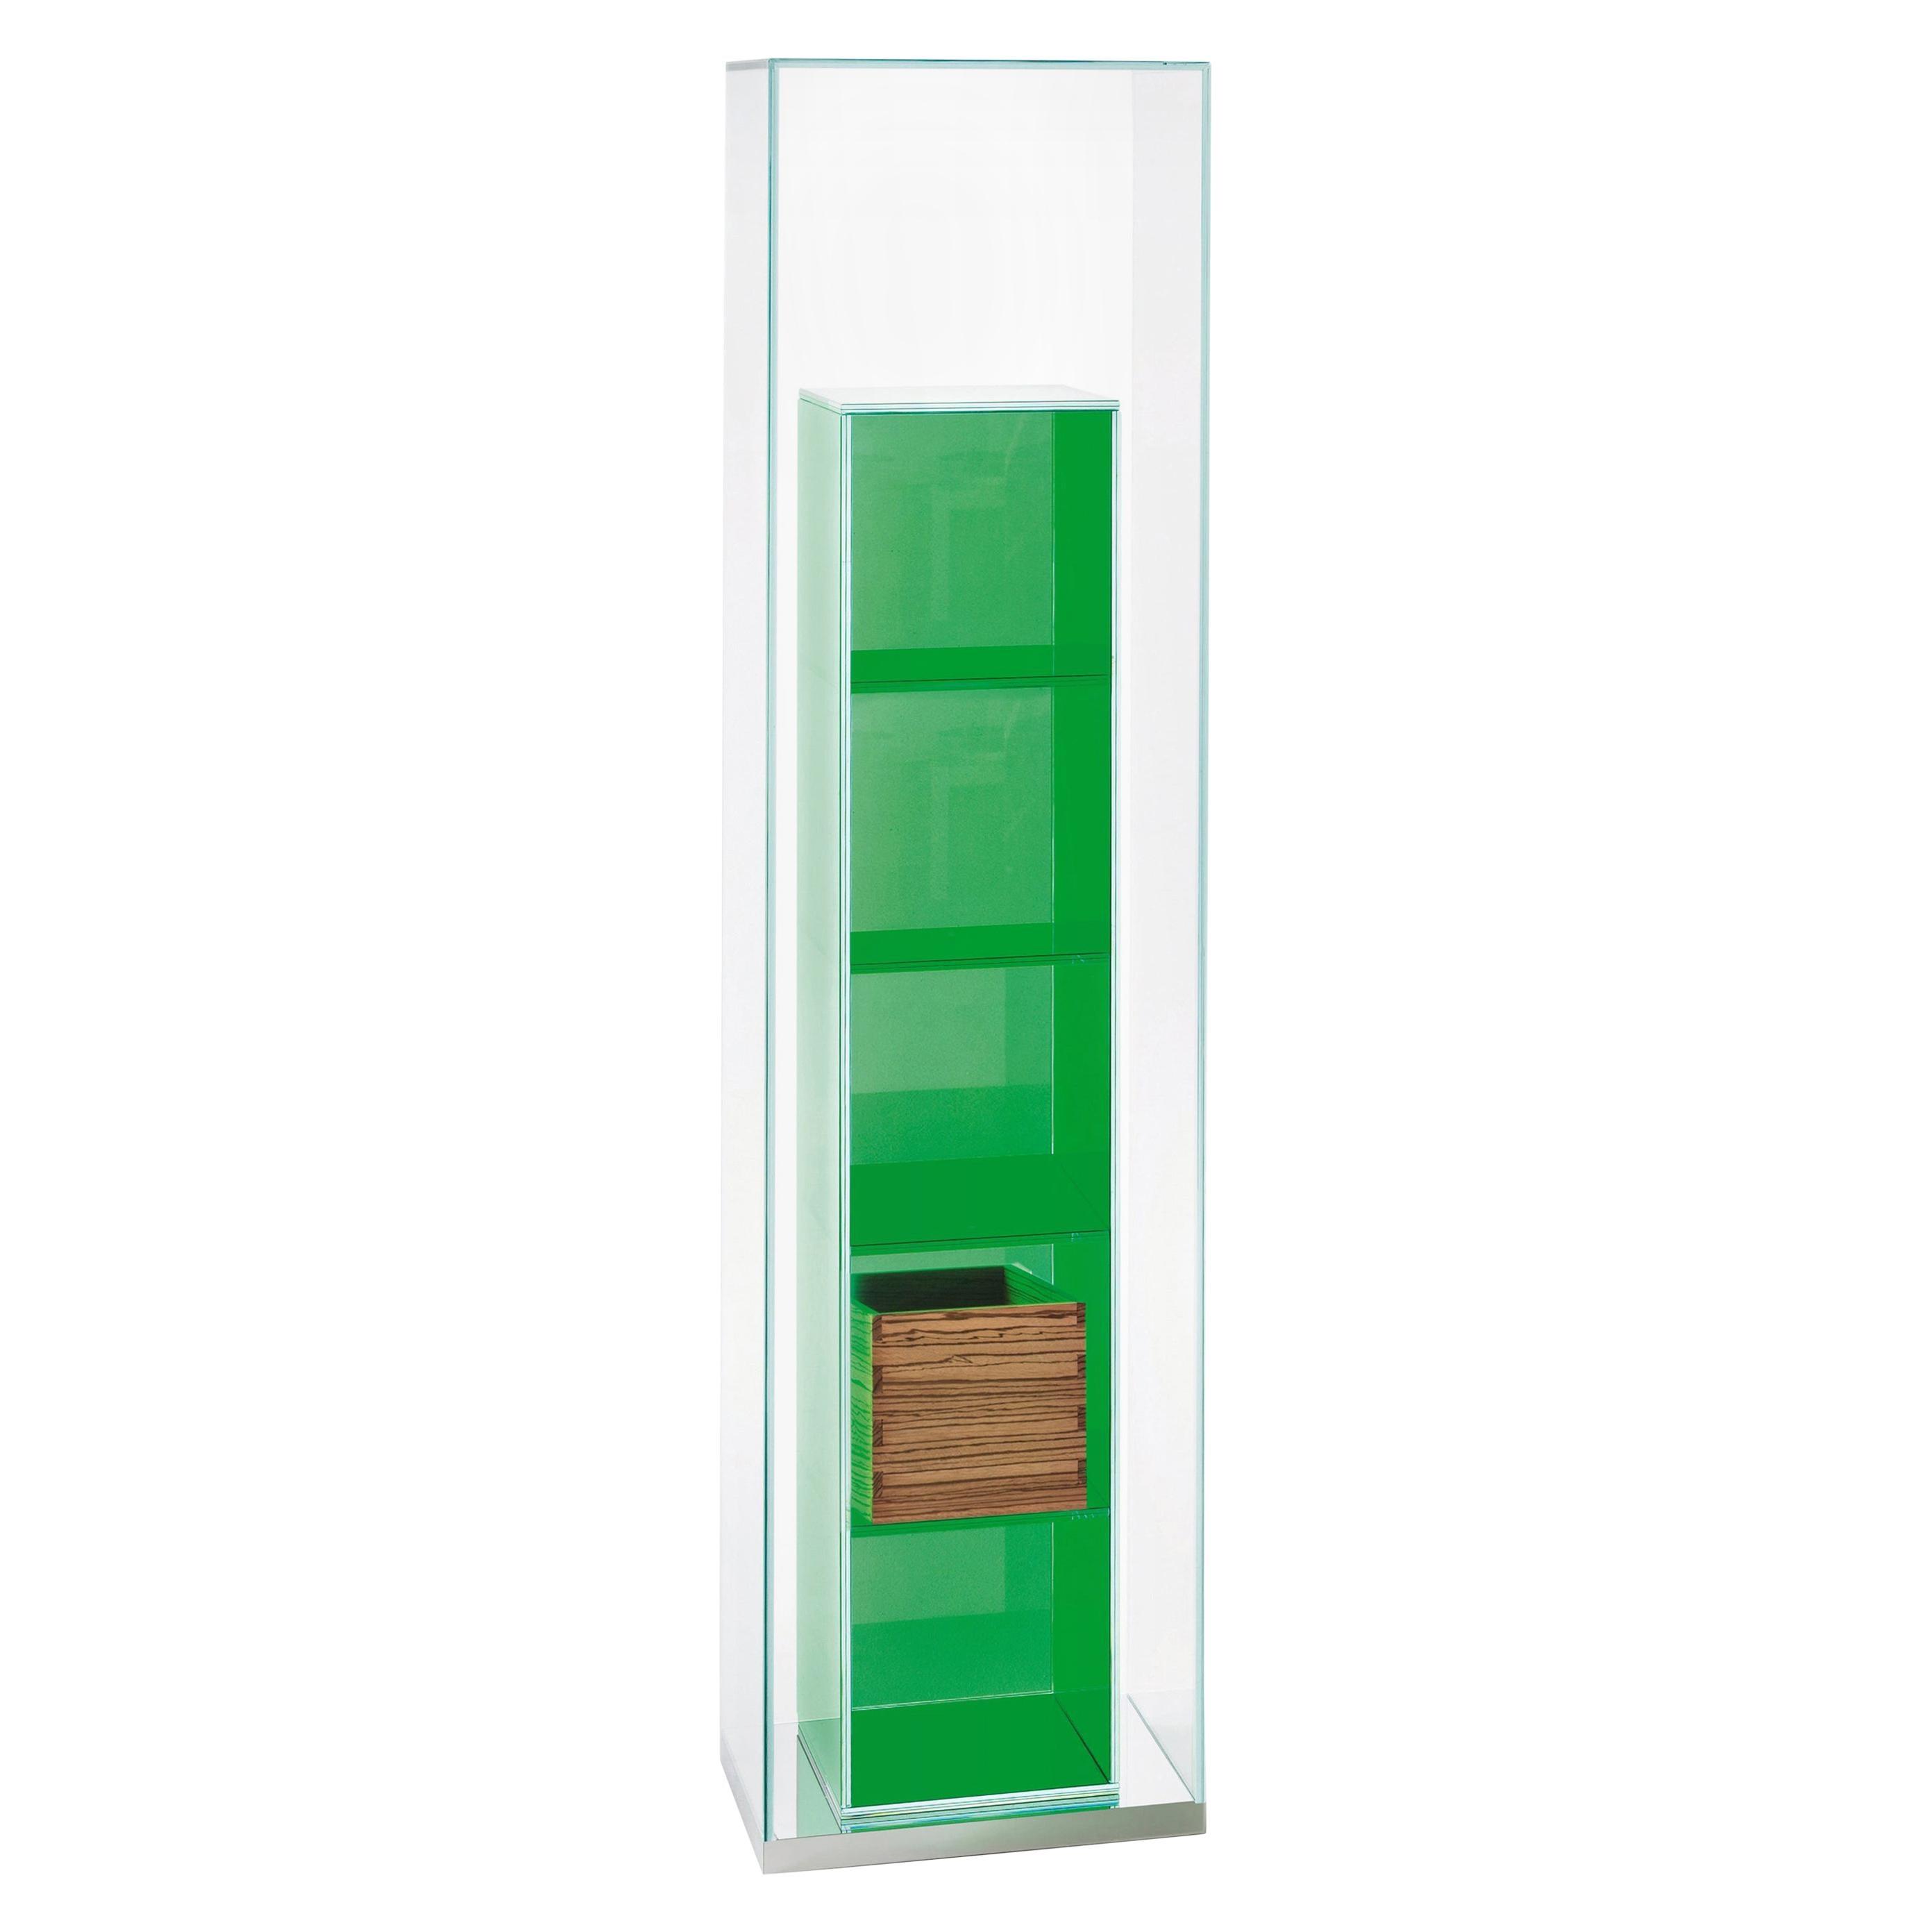 Boxinbox BIB02 Storage Unit, by Philippe Starck from Glas Italia